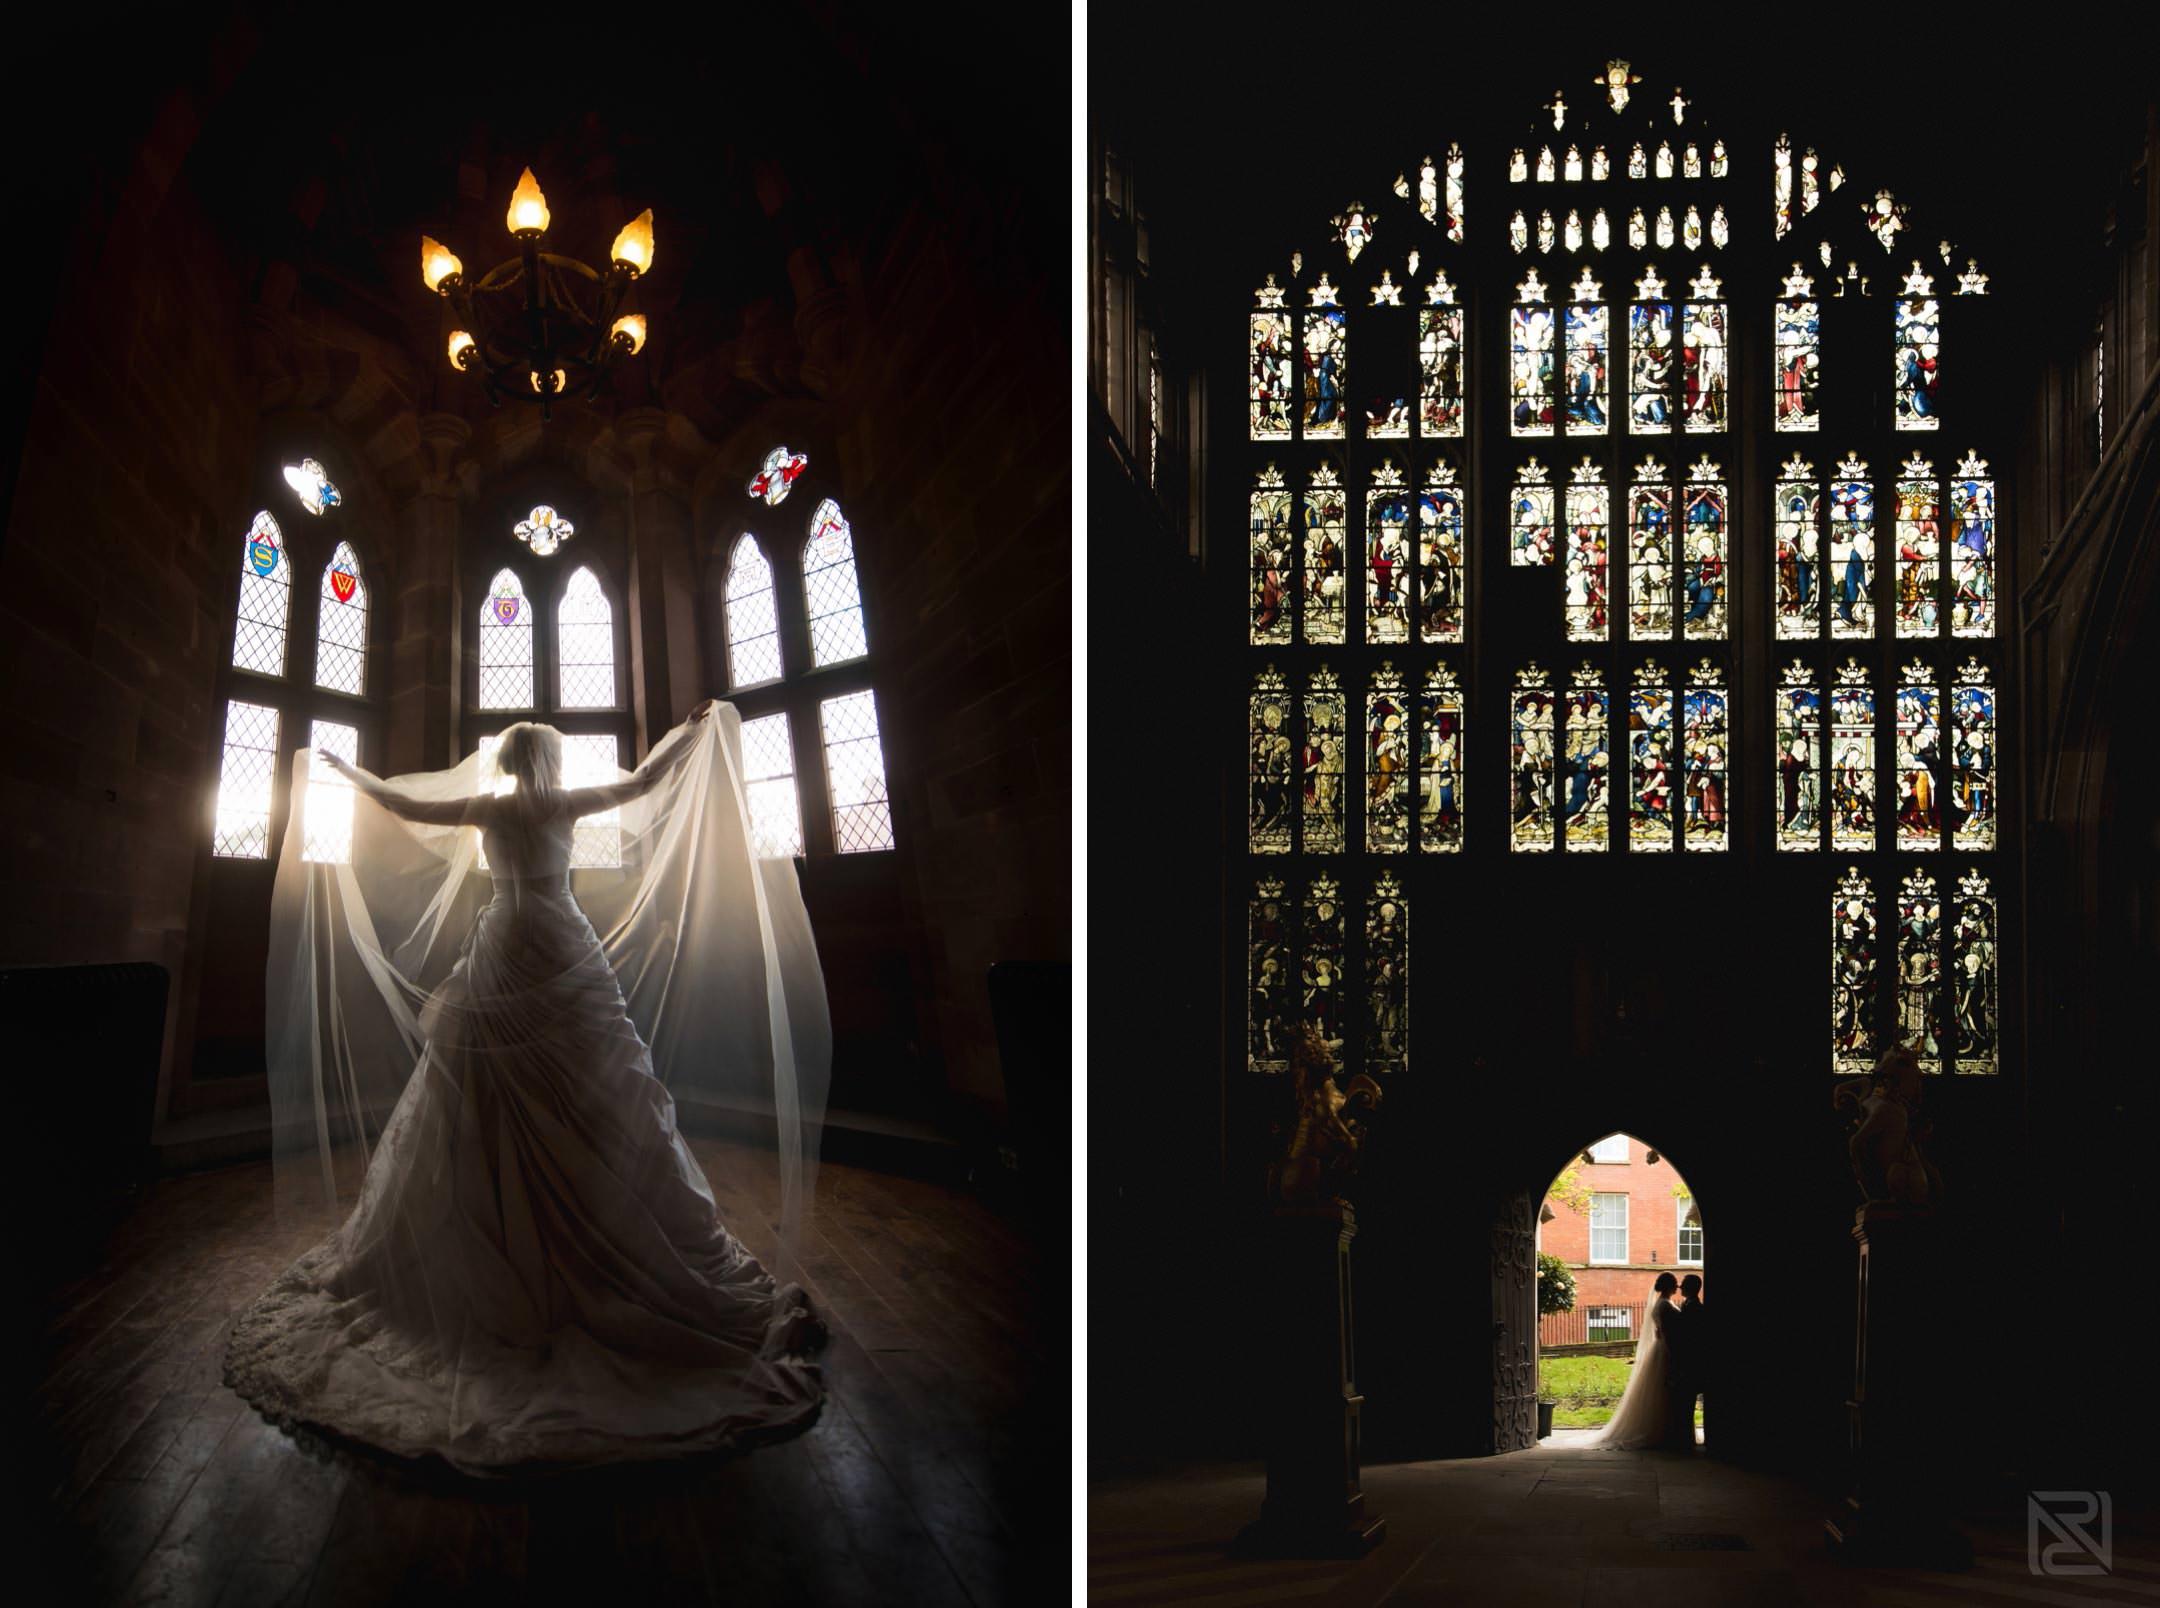 best-wedding-photographs-2015-051